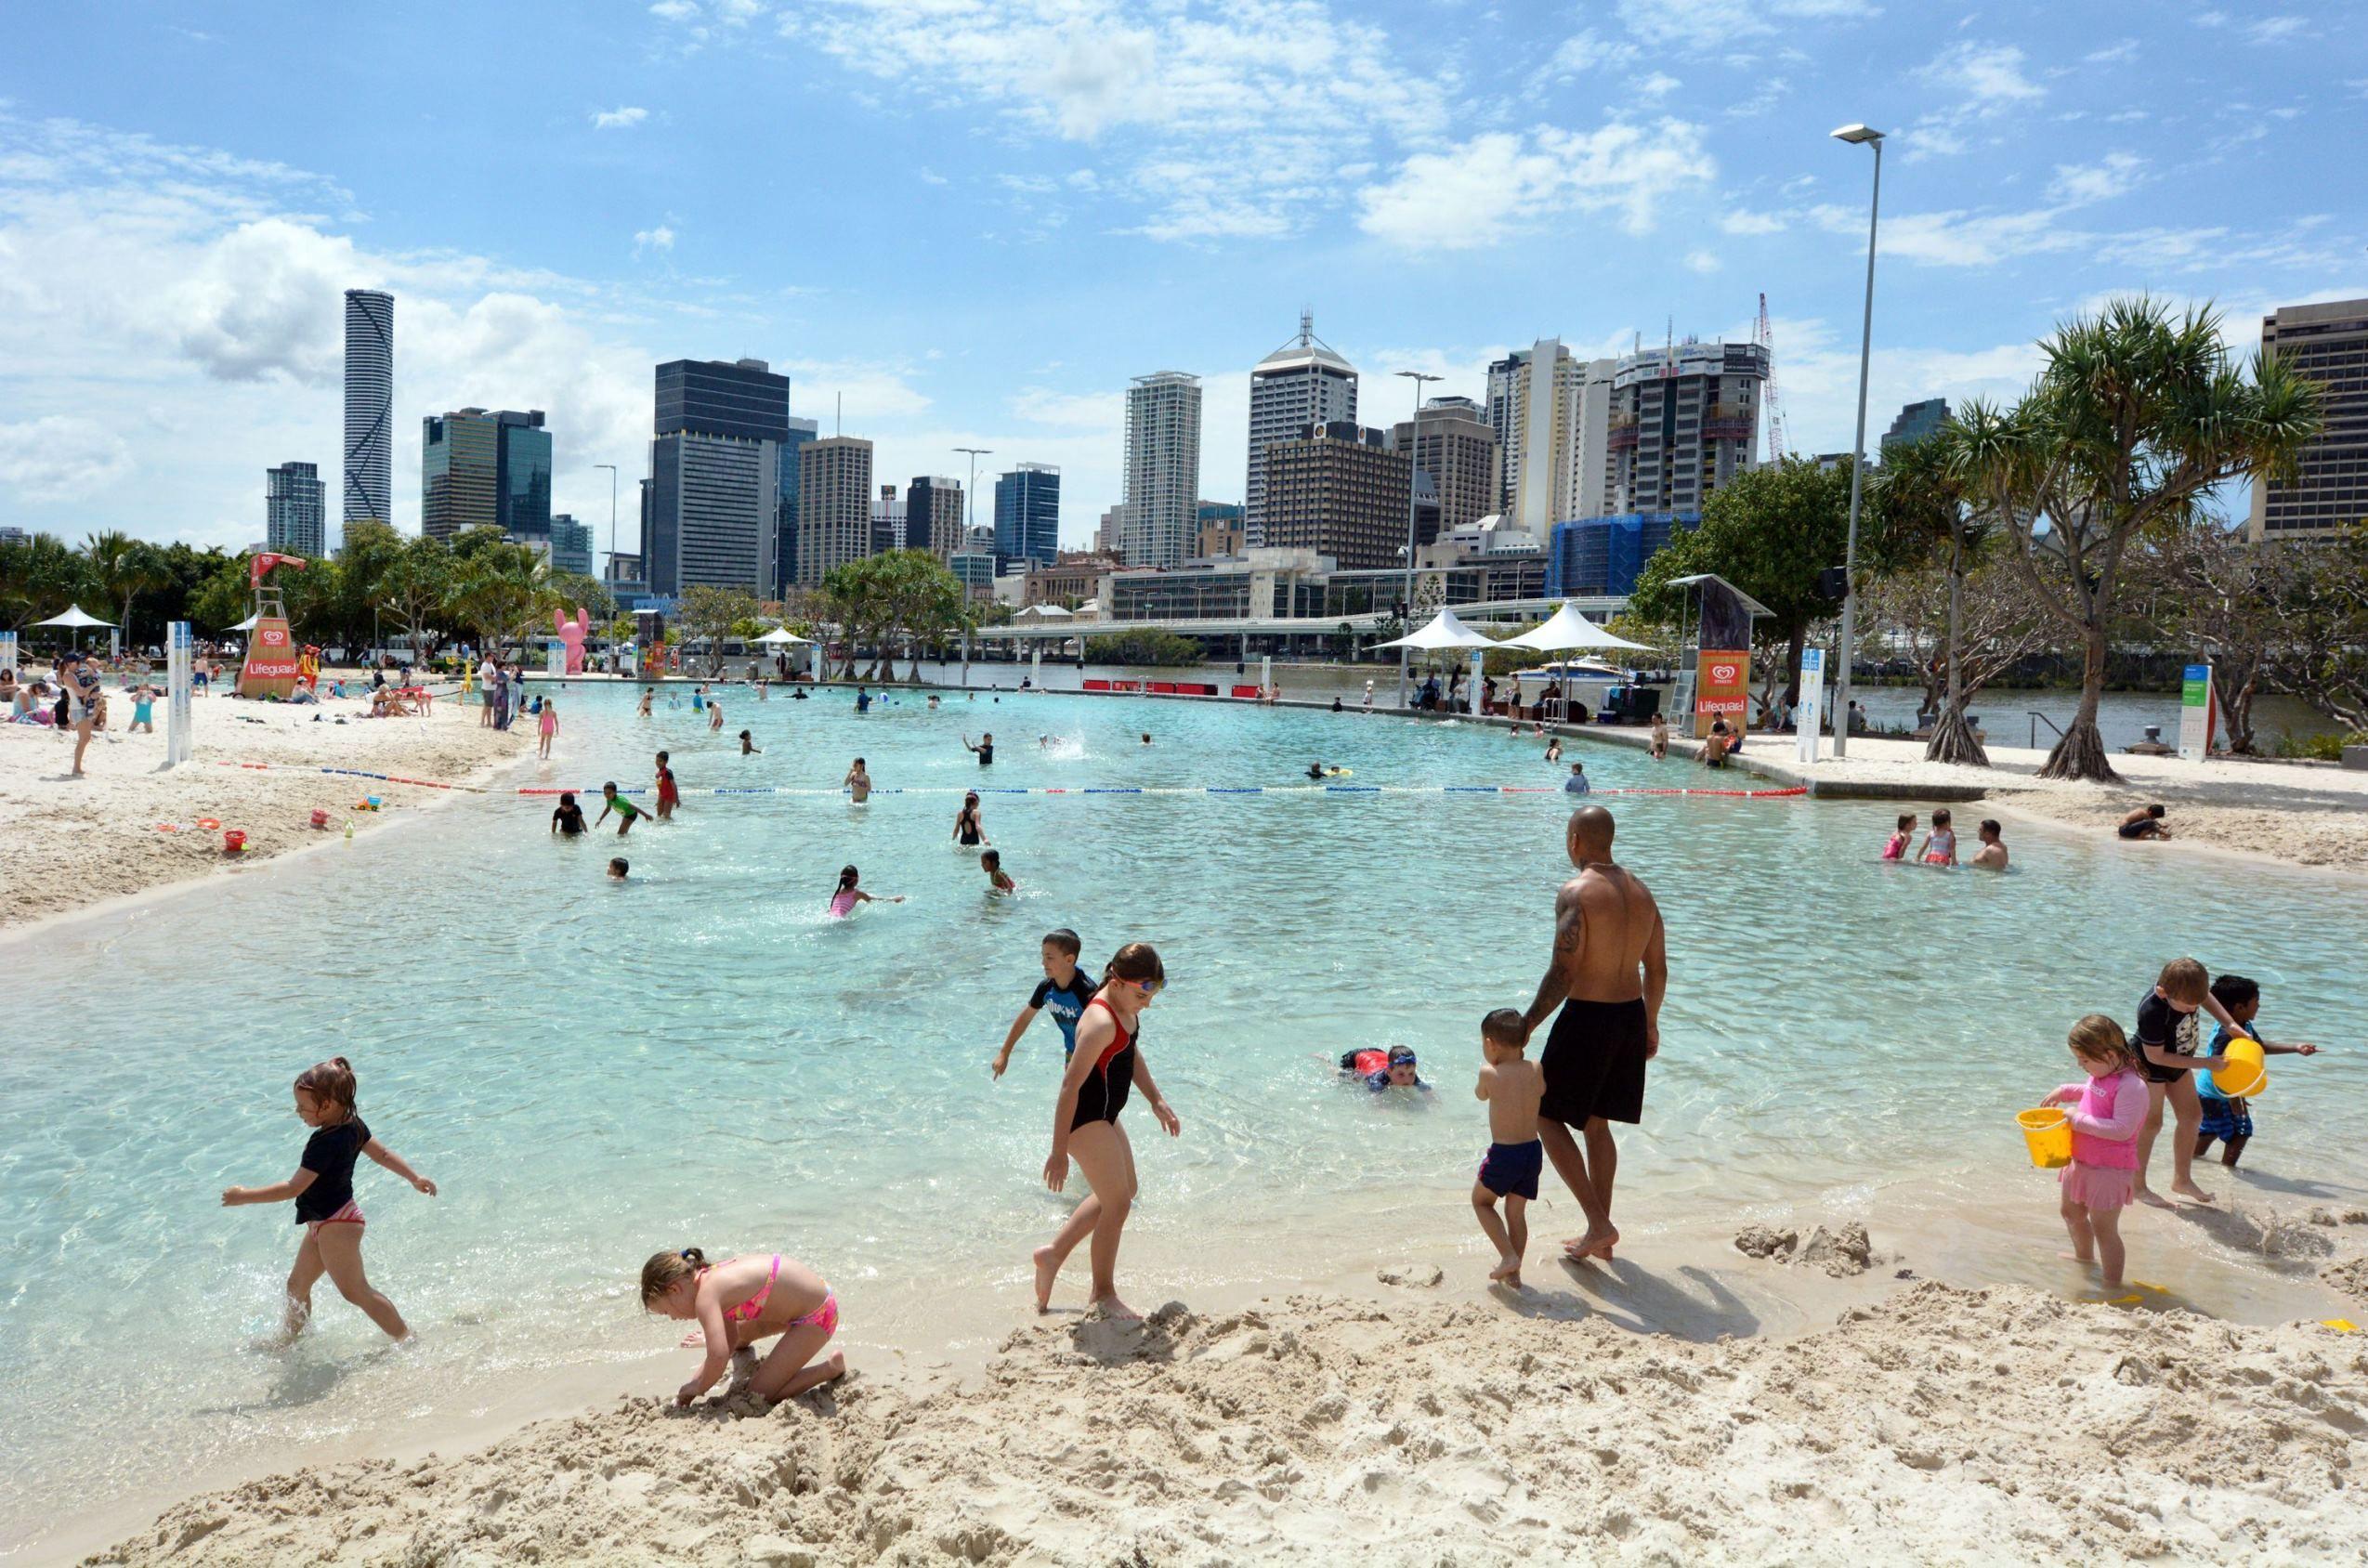 Man Made Beach Brisbane Australia The World S Best Urban Beaches